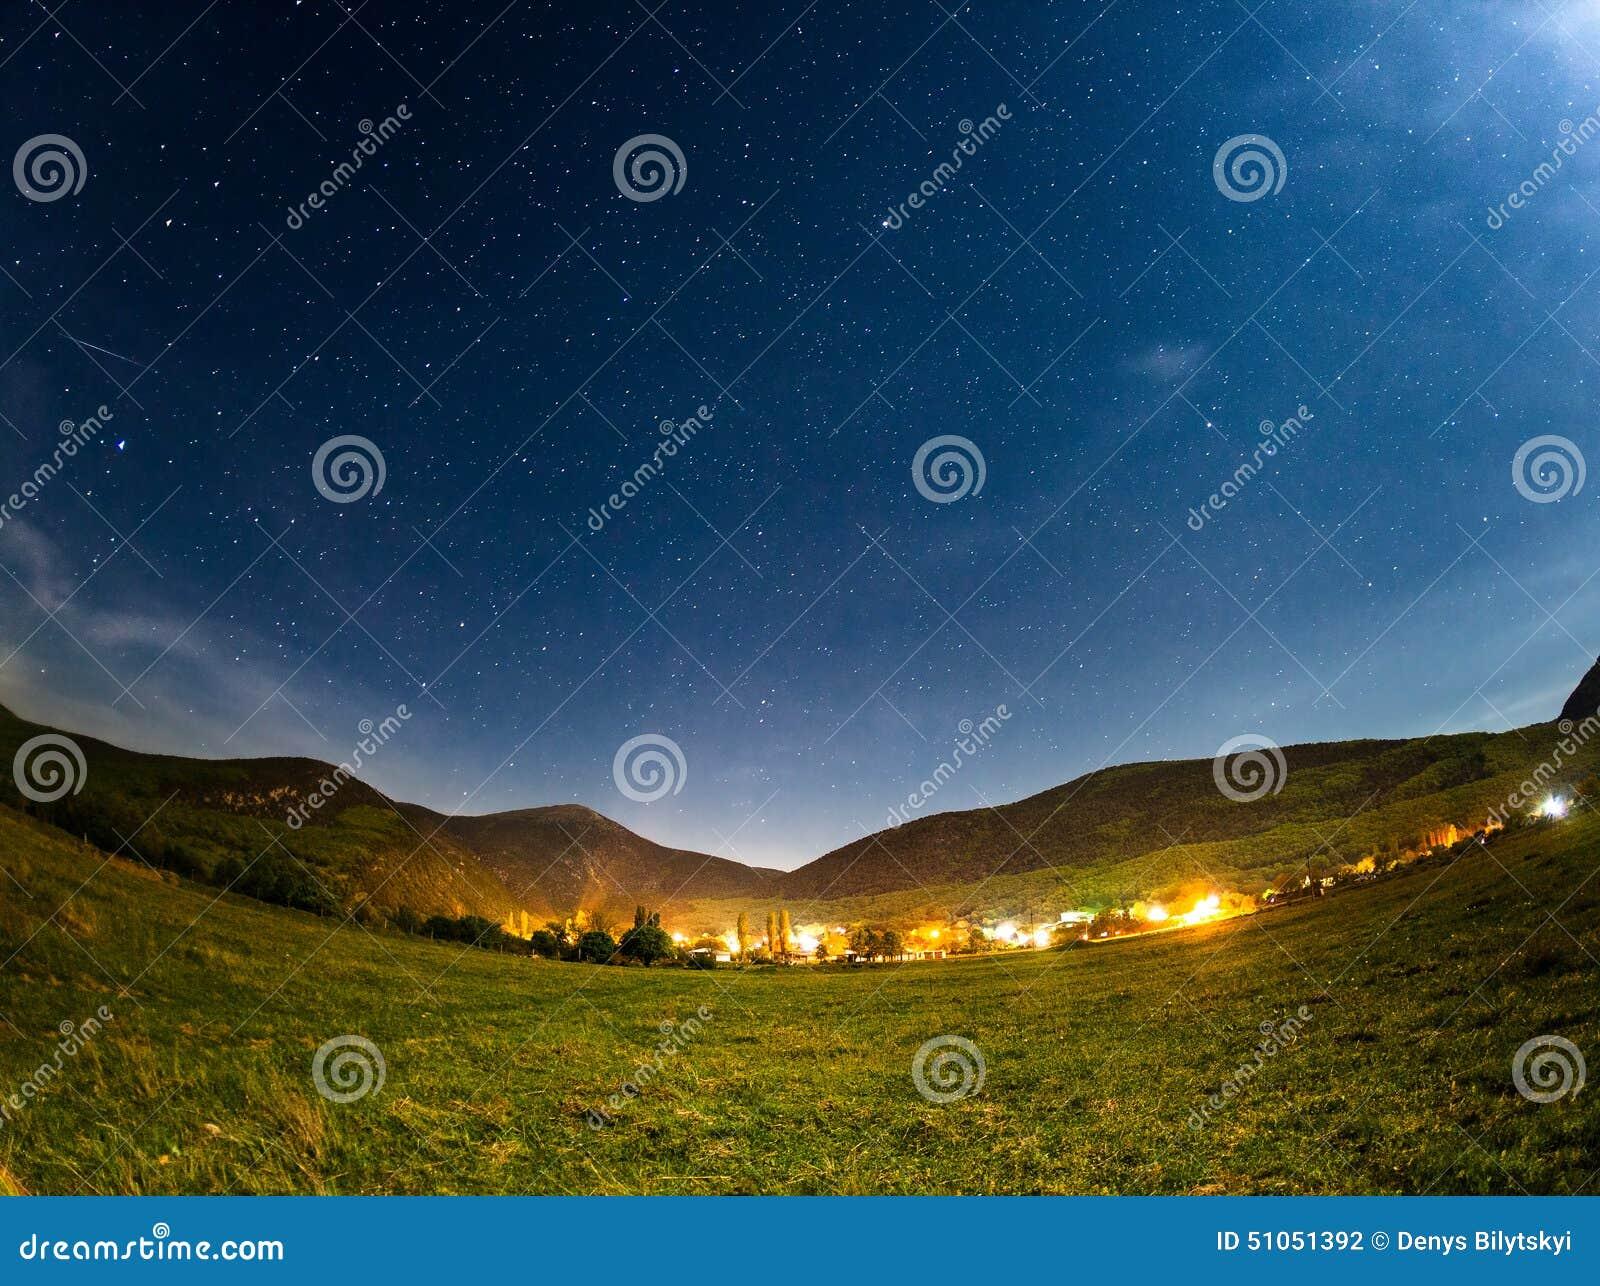 Sky Full Of Stars. Beautiful Summer Night Stock Photo